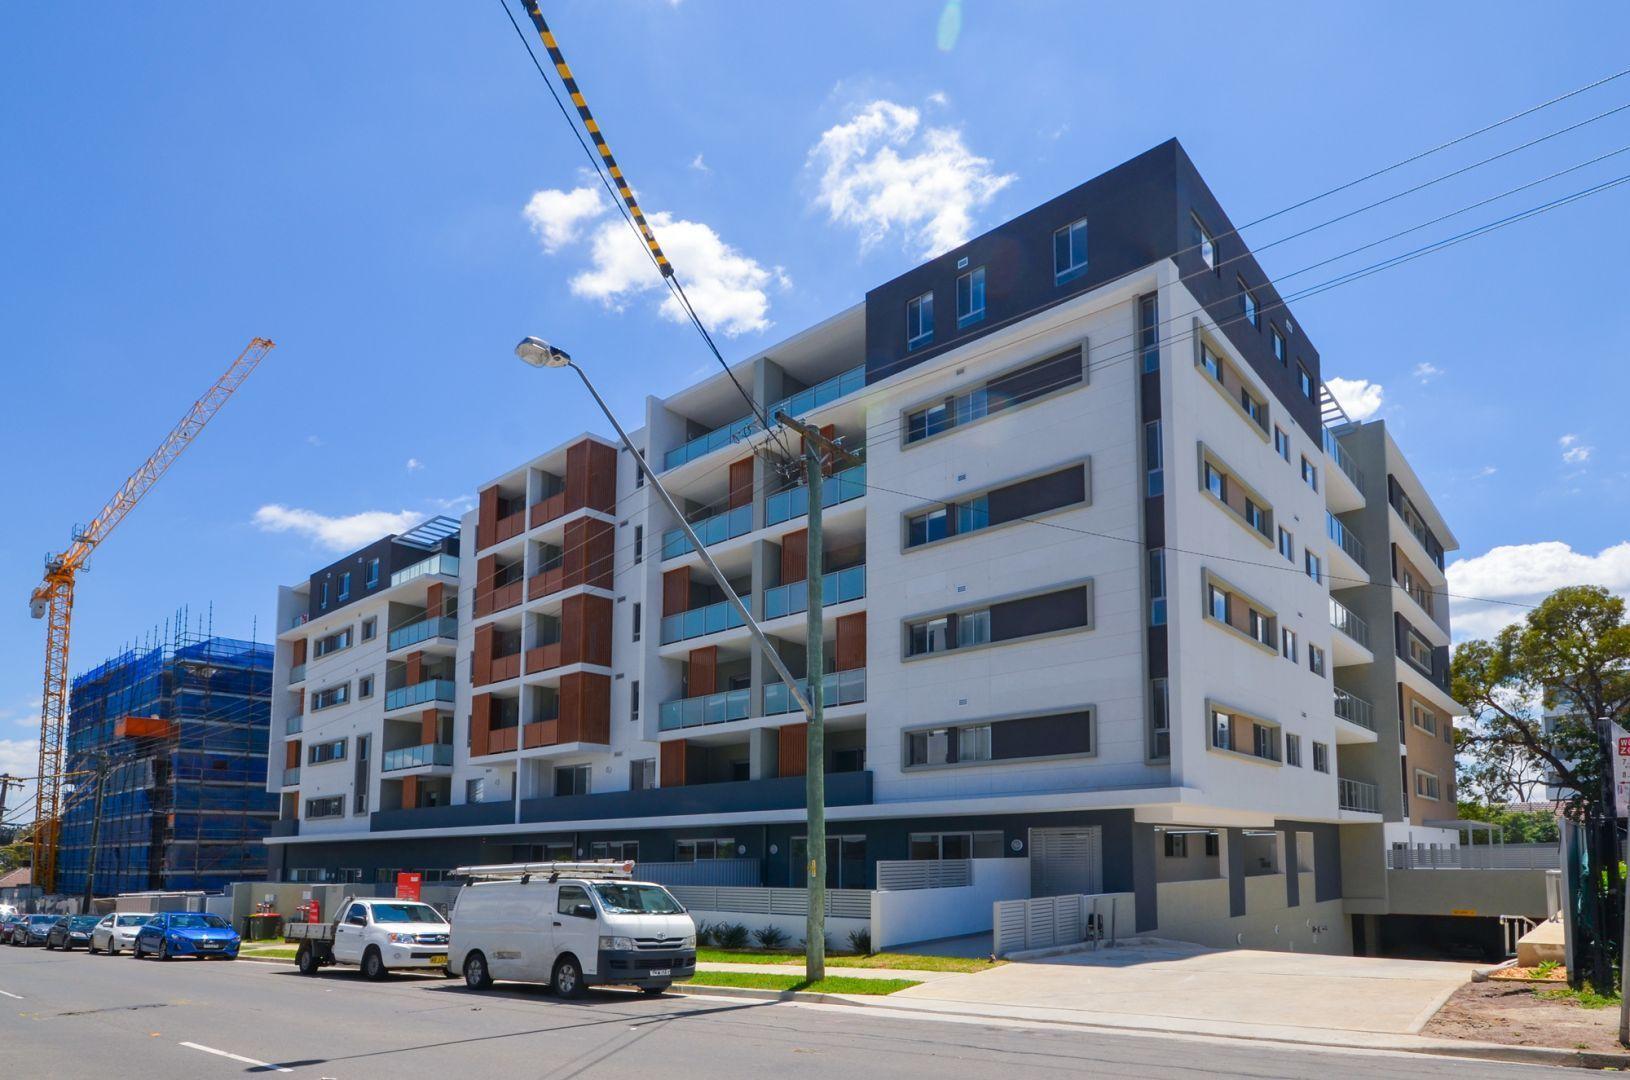 L5/32 Chamberlain, Campbelltown NSW 2560, Image 1